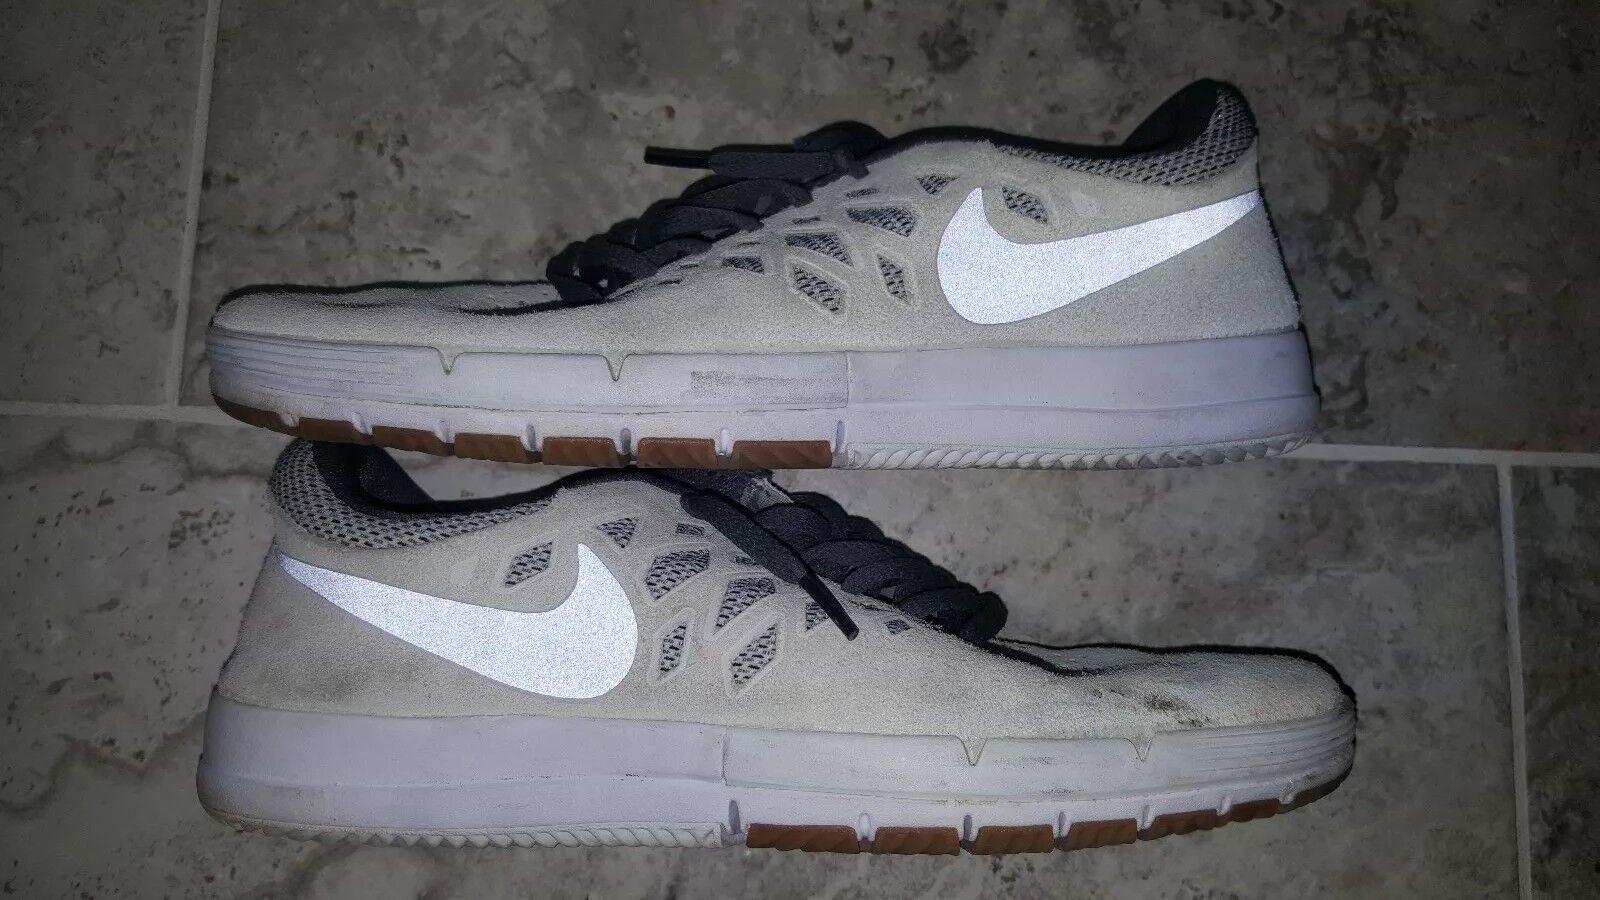 Nike libera sb vela grey Uomo skateboard scarpe scarpe 704936-101 sz us9 uk8